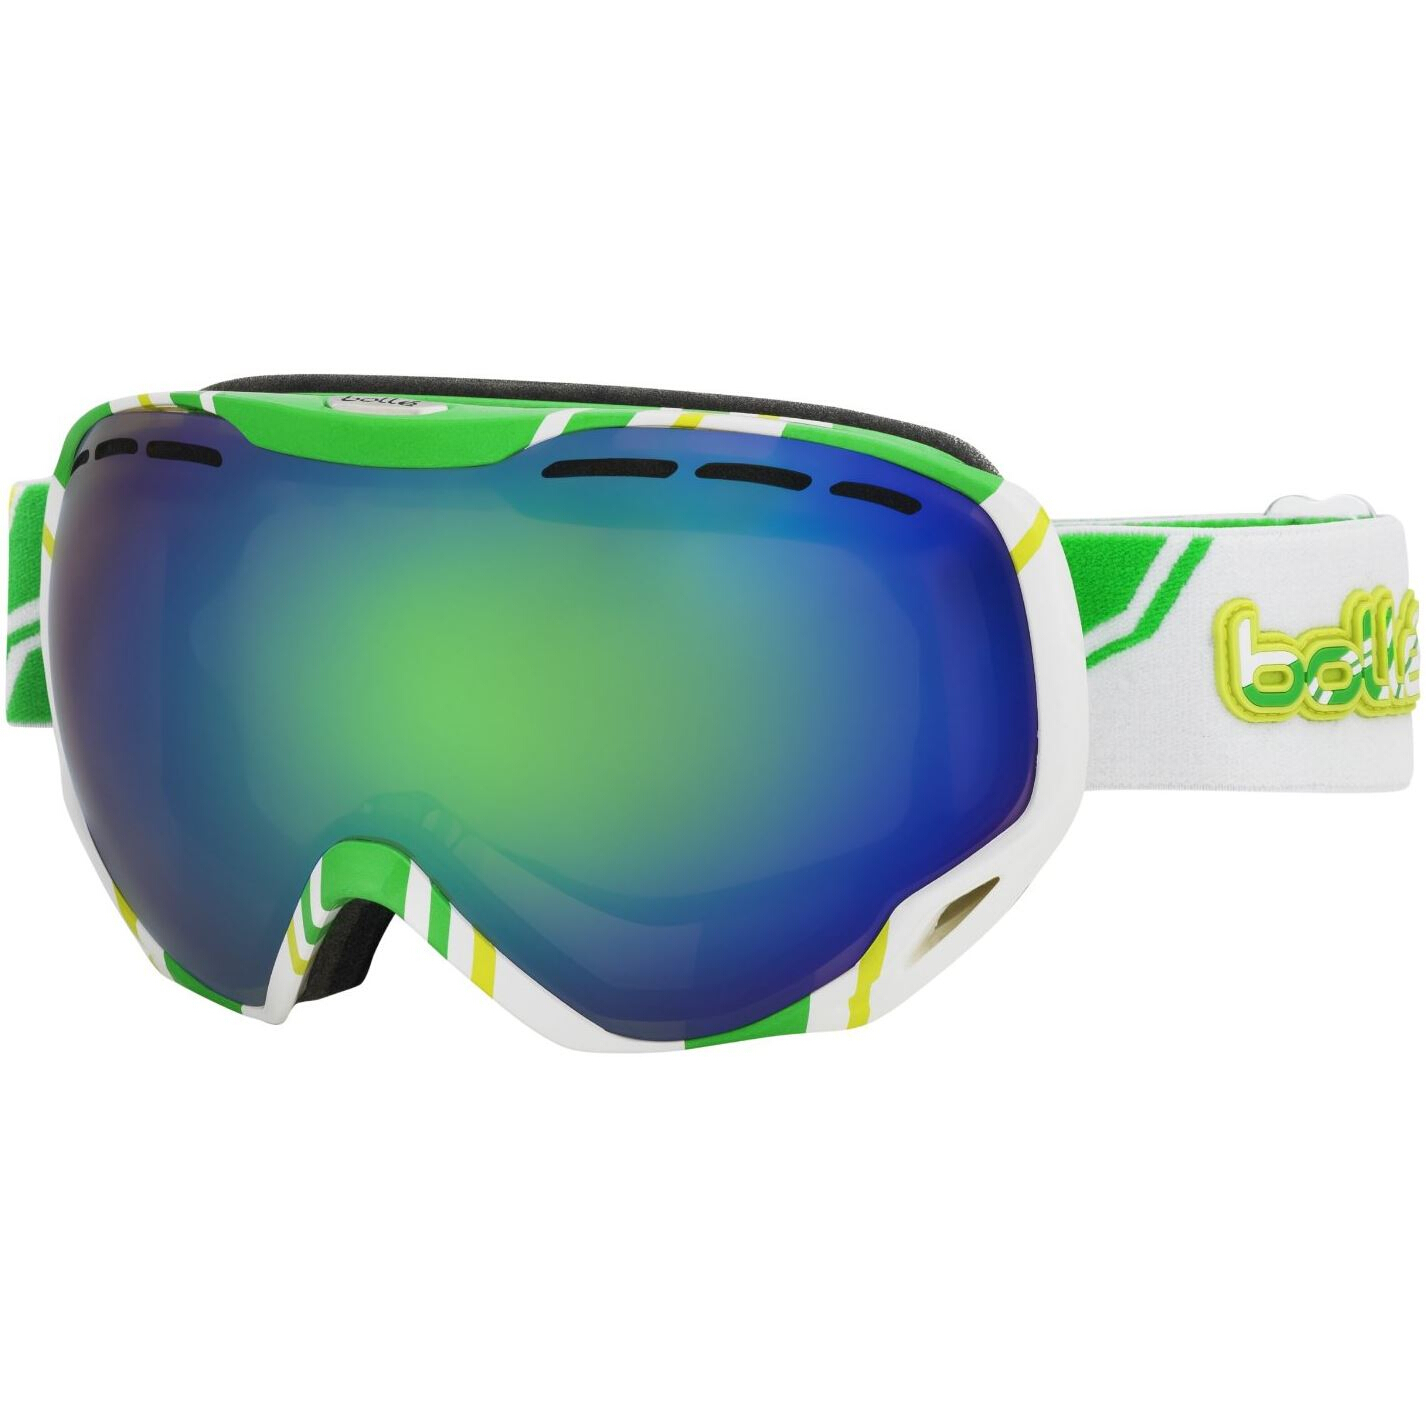 Bolle Emperor Ski Snowboard Goggles Matte Black Frame and Vermillon Gun Lens 2 by Bolle Serengeti Eyewear